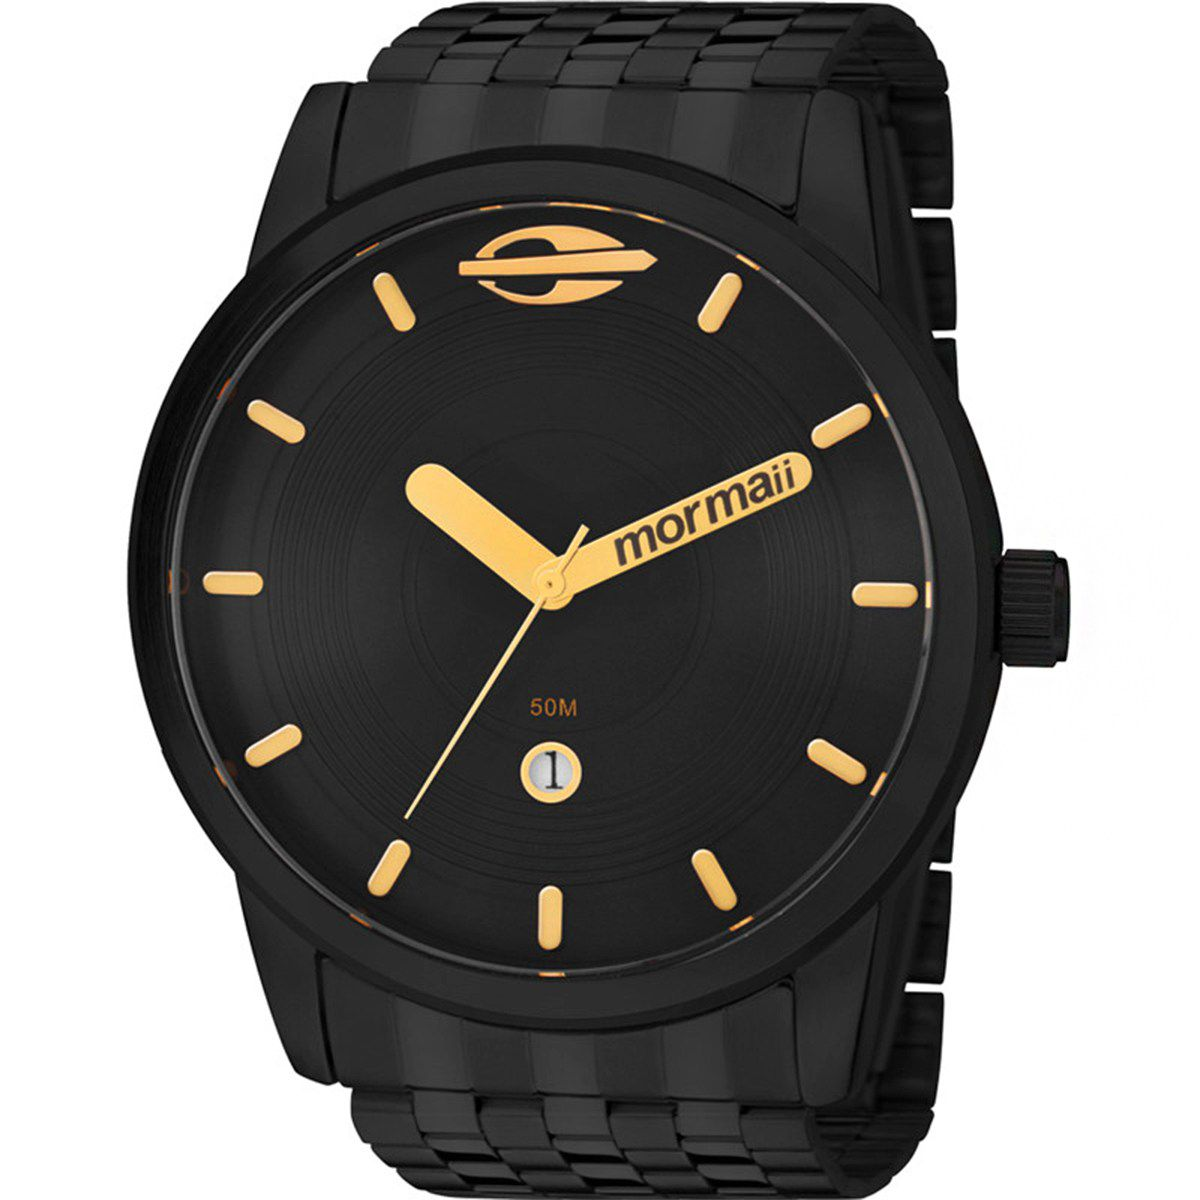 Relógio Mormaii Preto Masculino Maui Analógico MO2115AA/4P